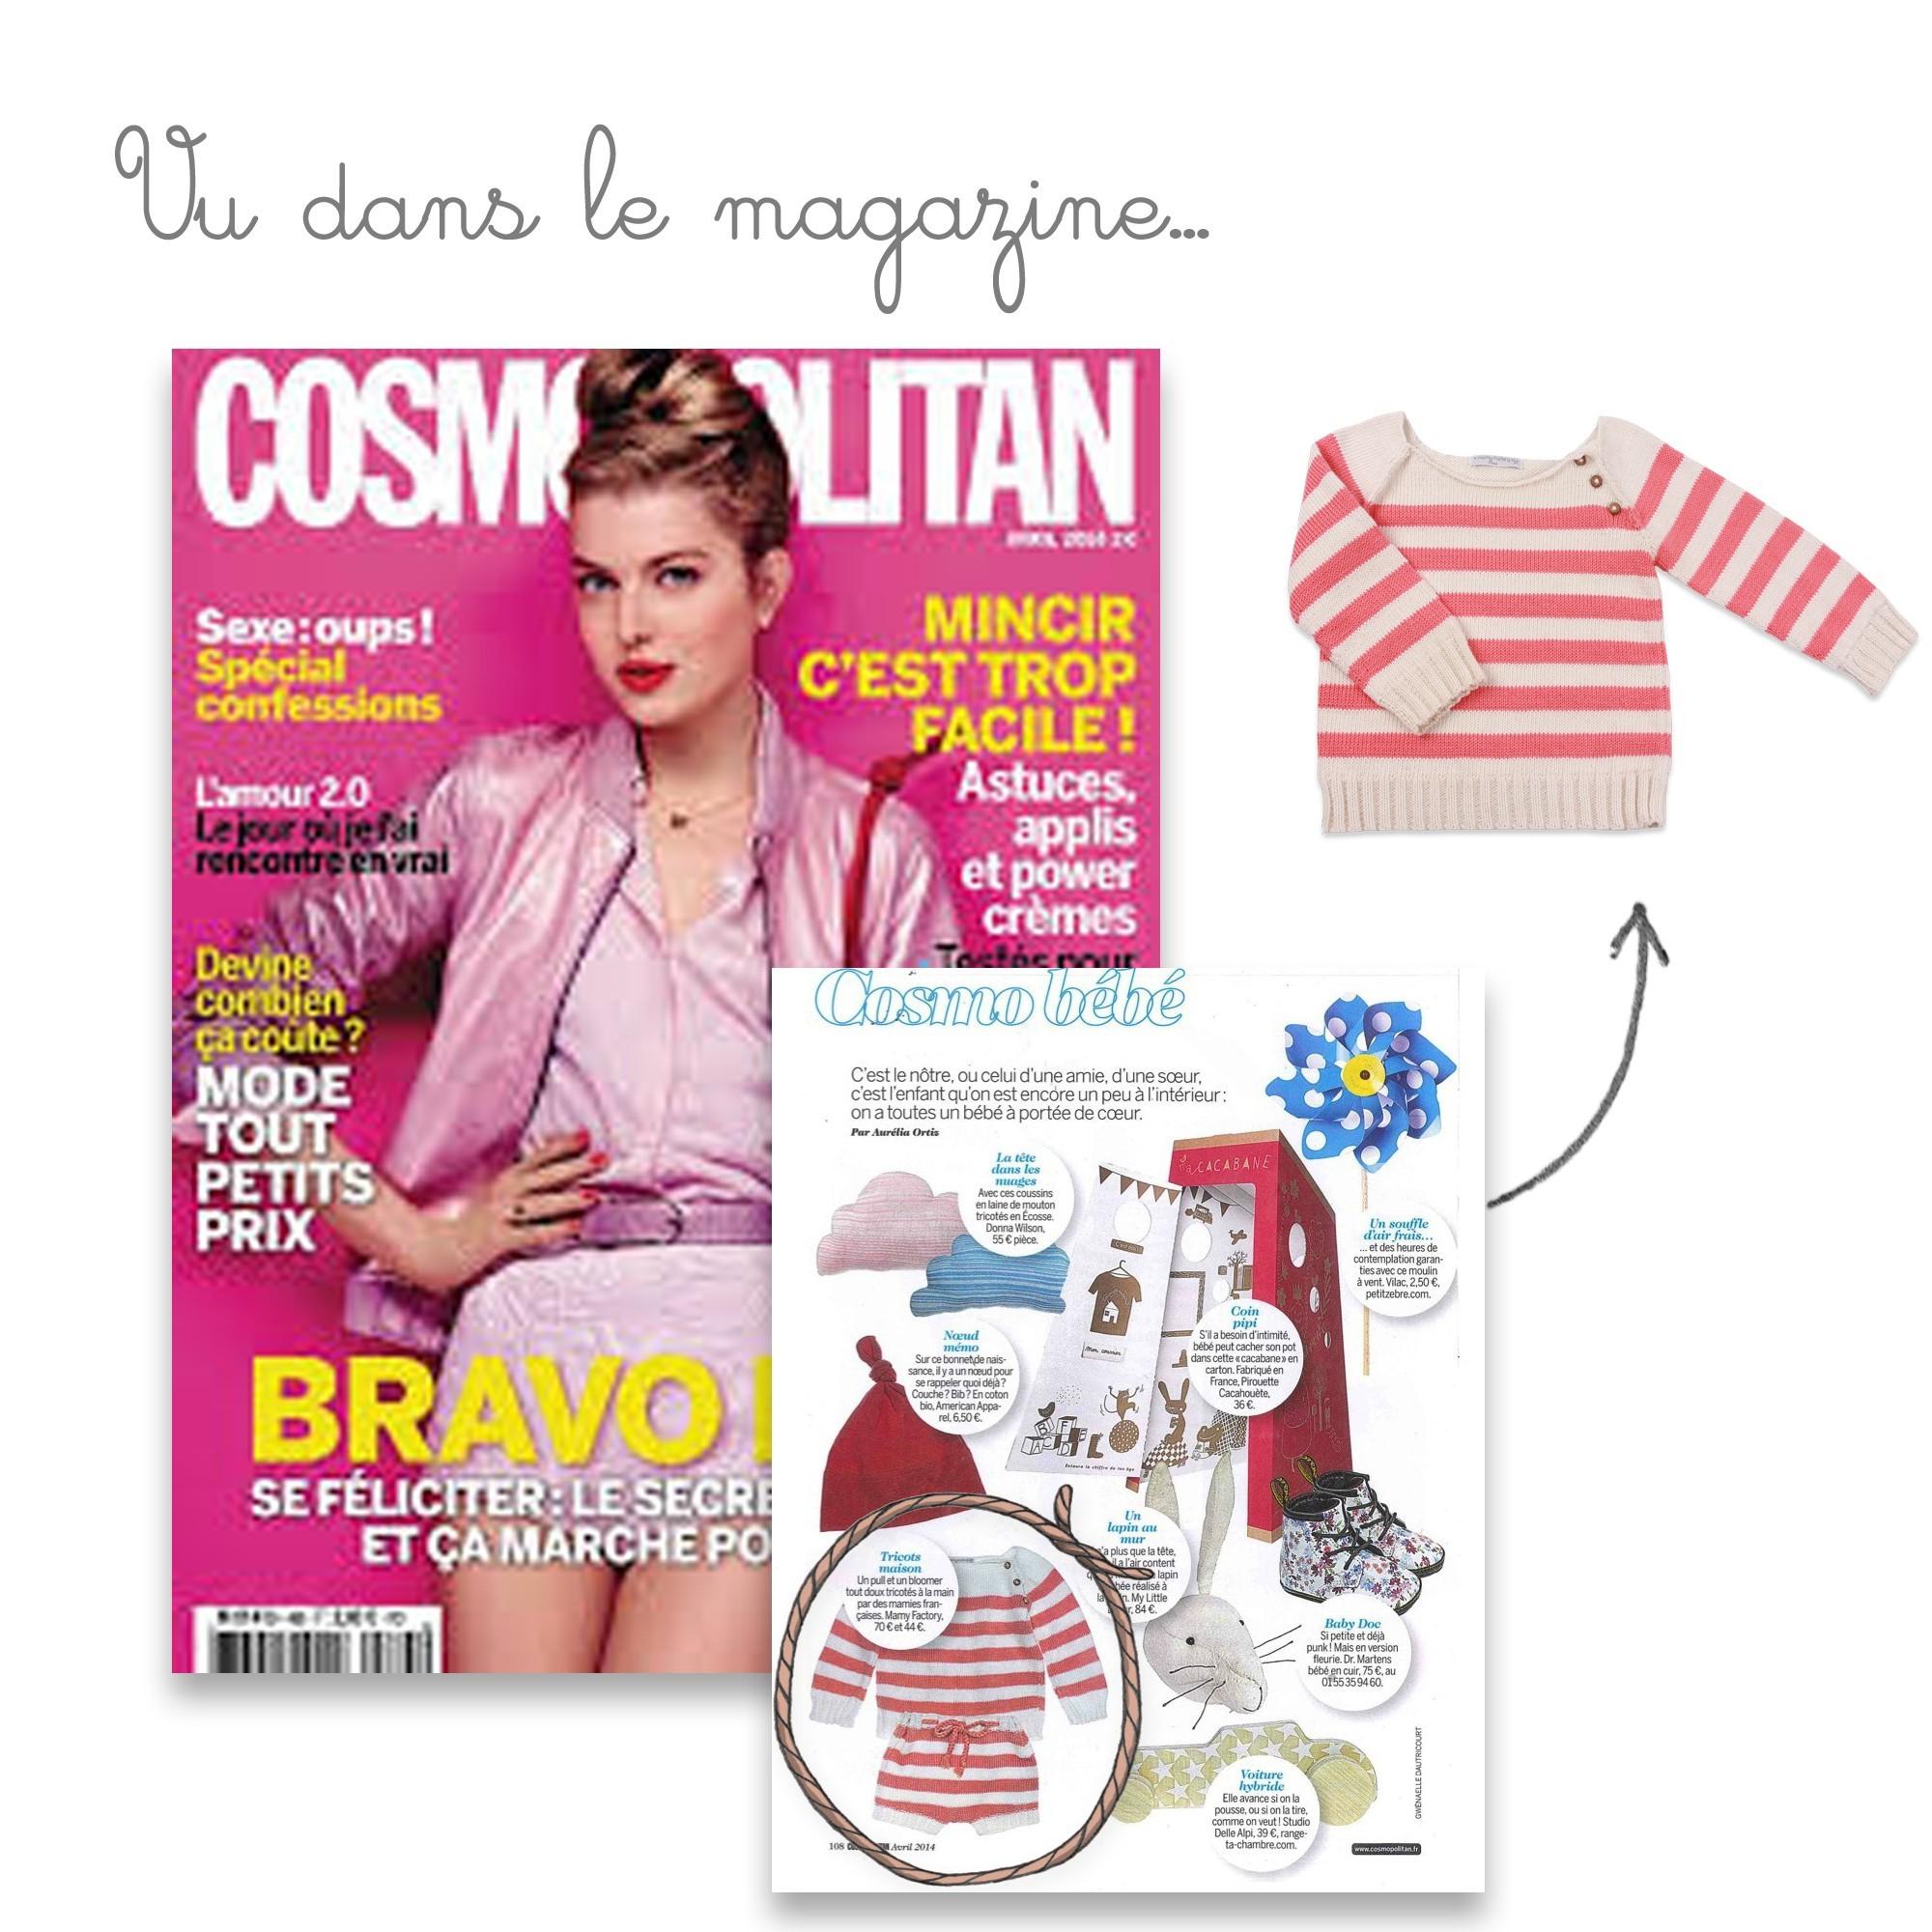 Pull Gaspard vu dans le magazine Cosmopolitan